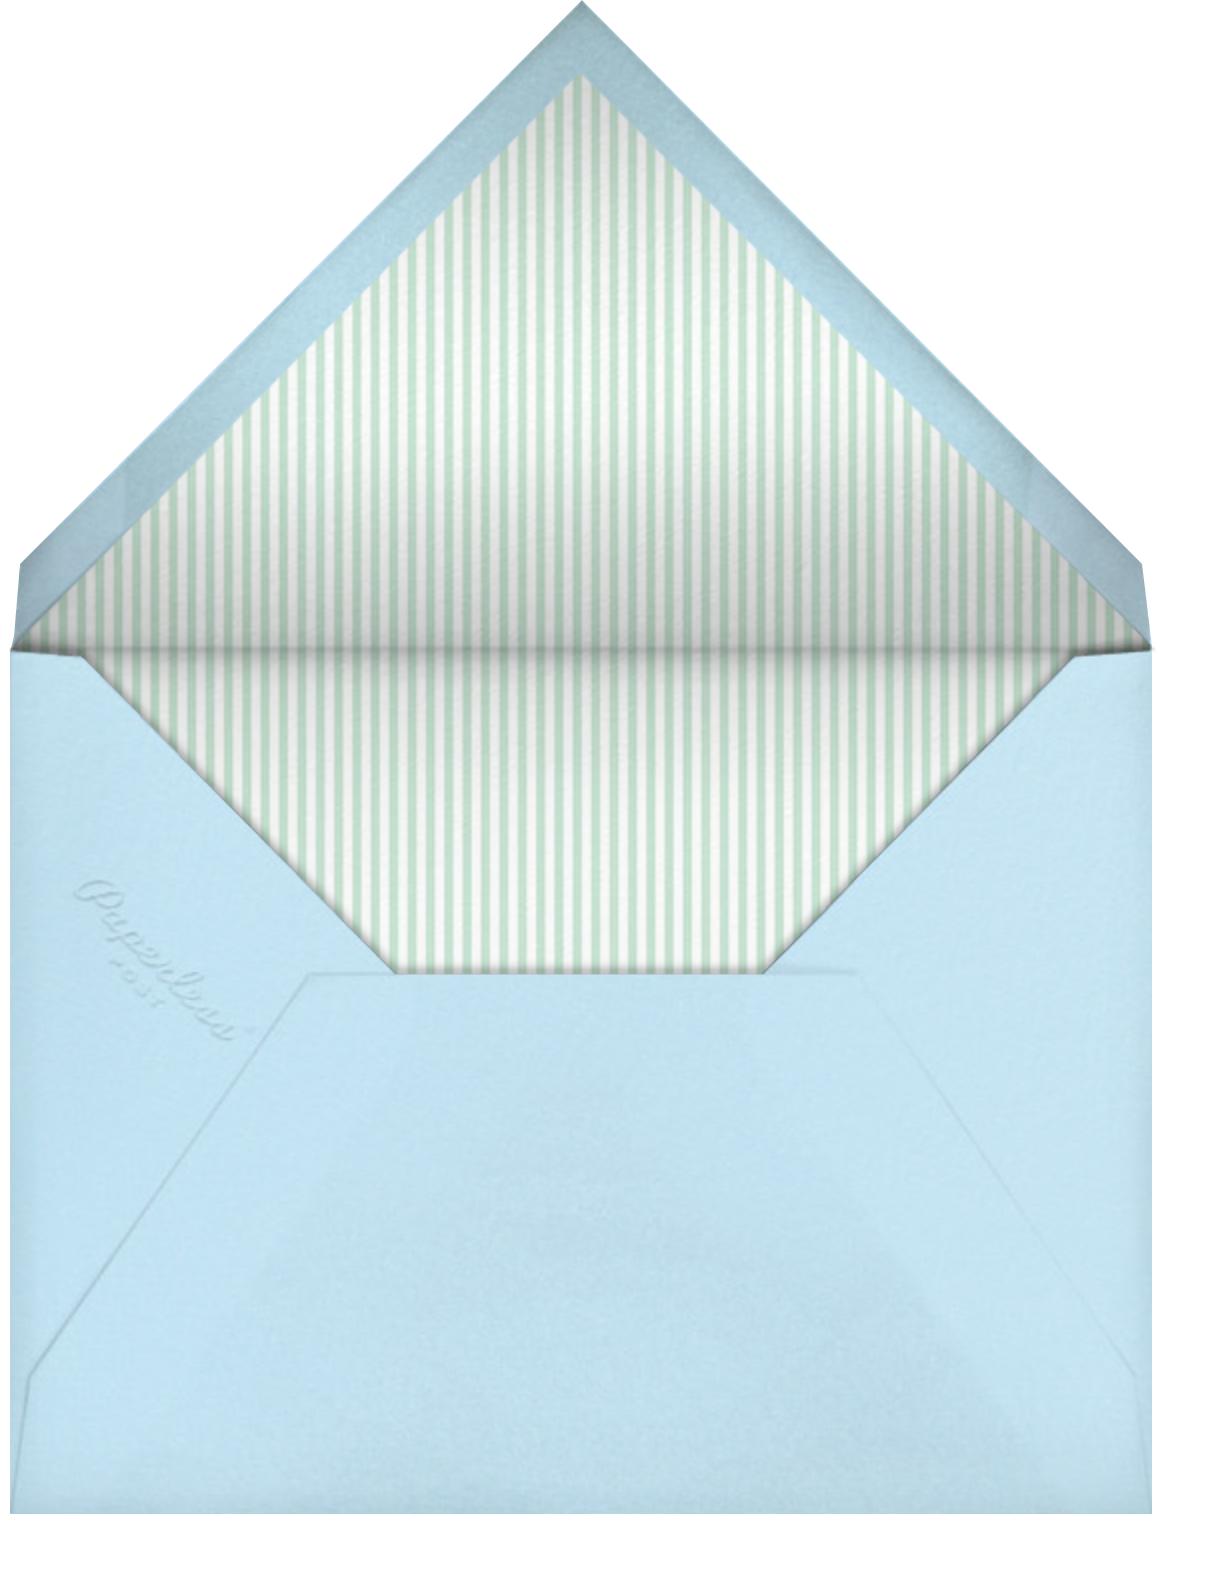 Ellie's Party - Blue - Little Cube - Baby shower - envelope back